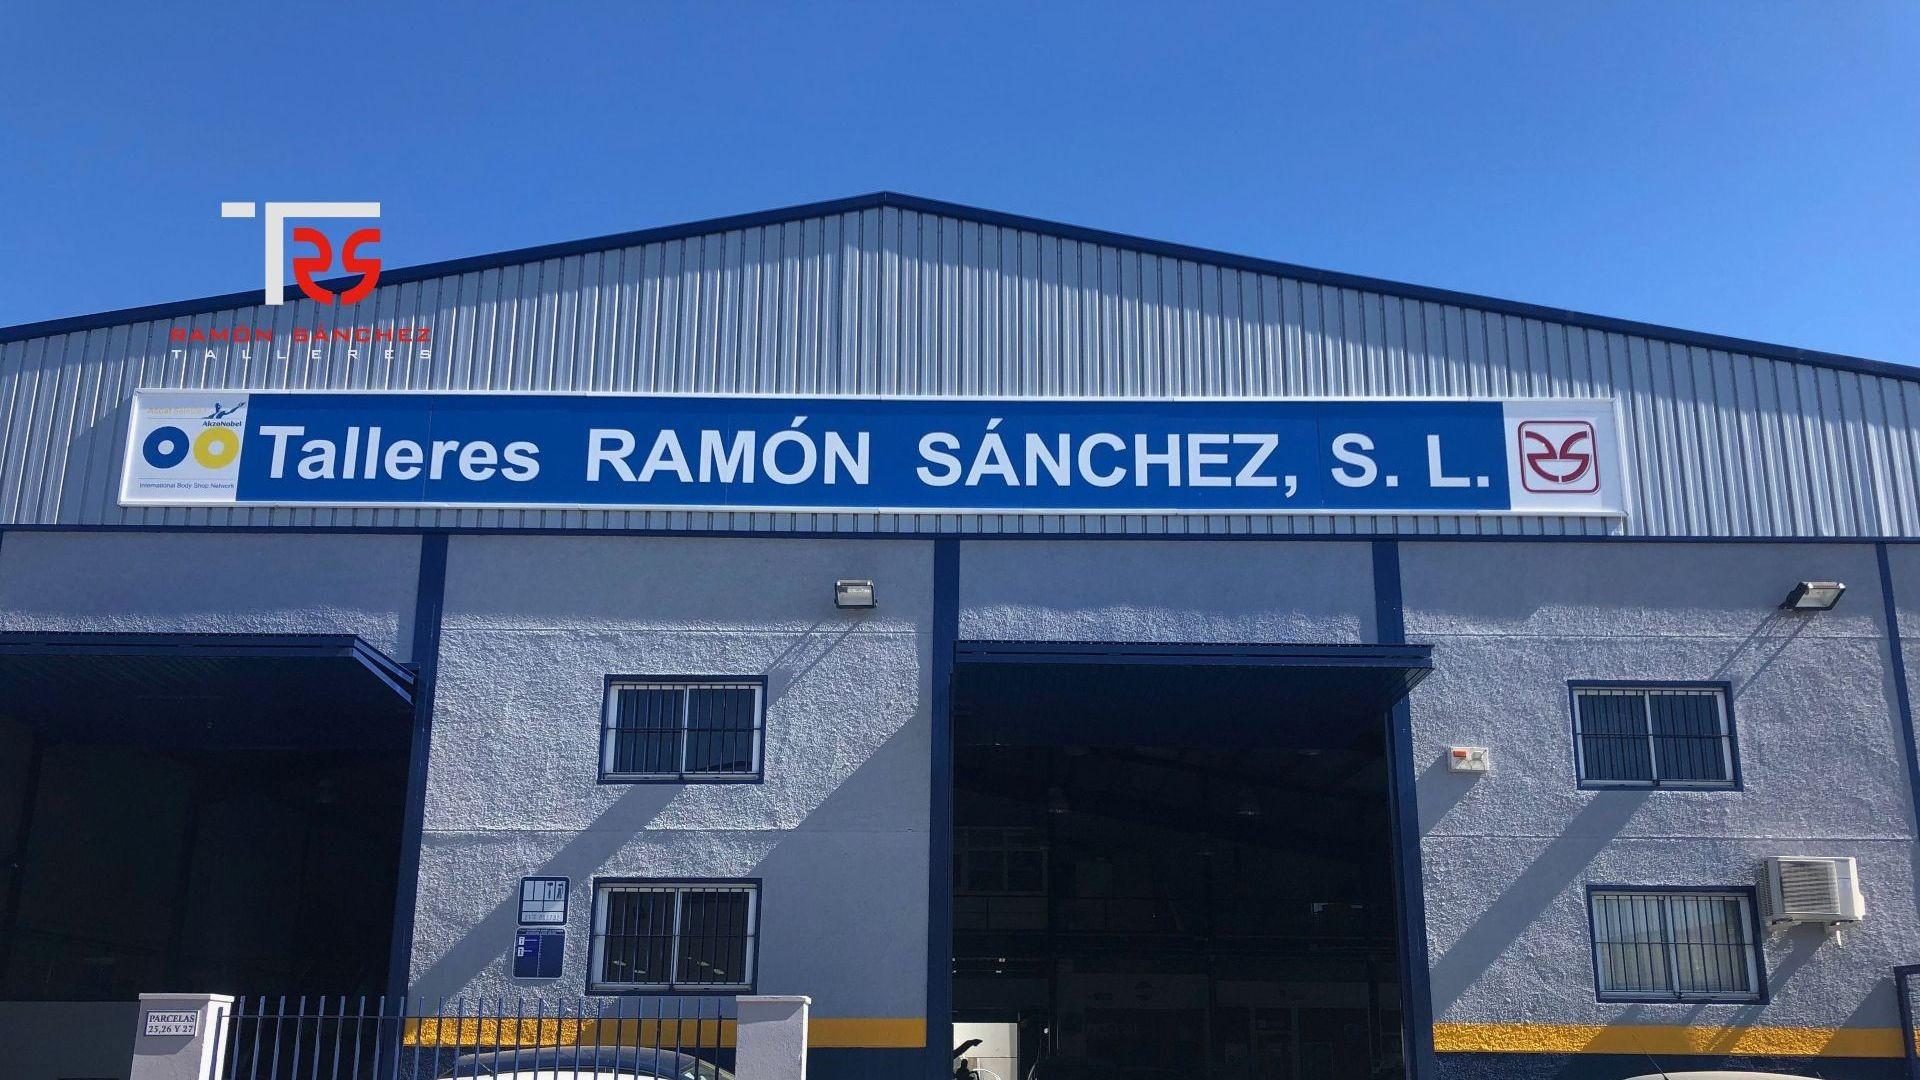 Taller de automóviles Ramón Sanchez